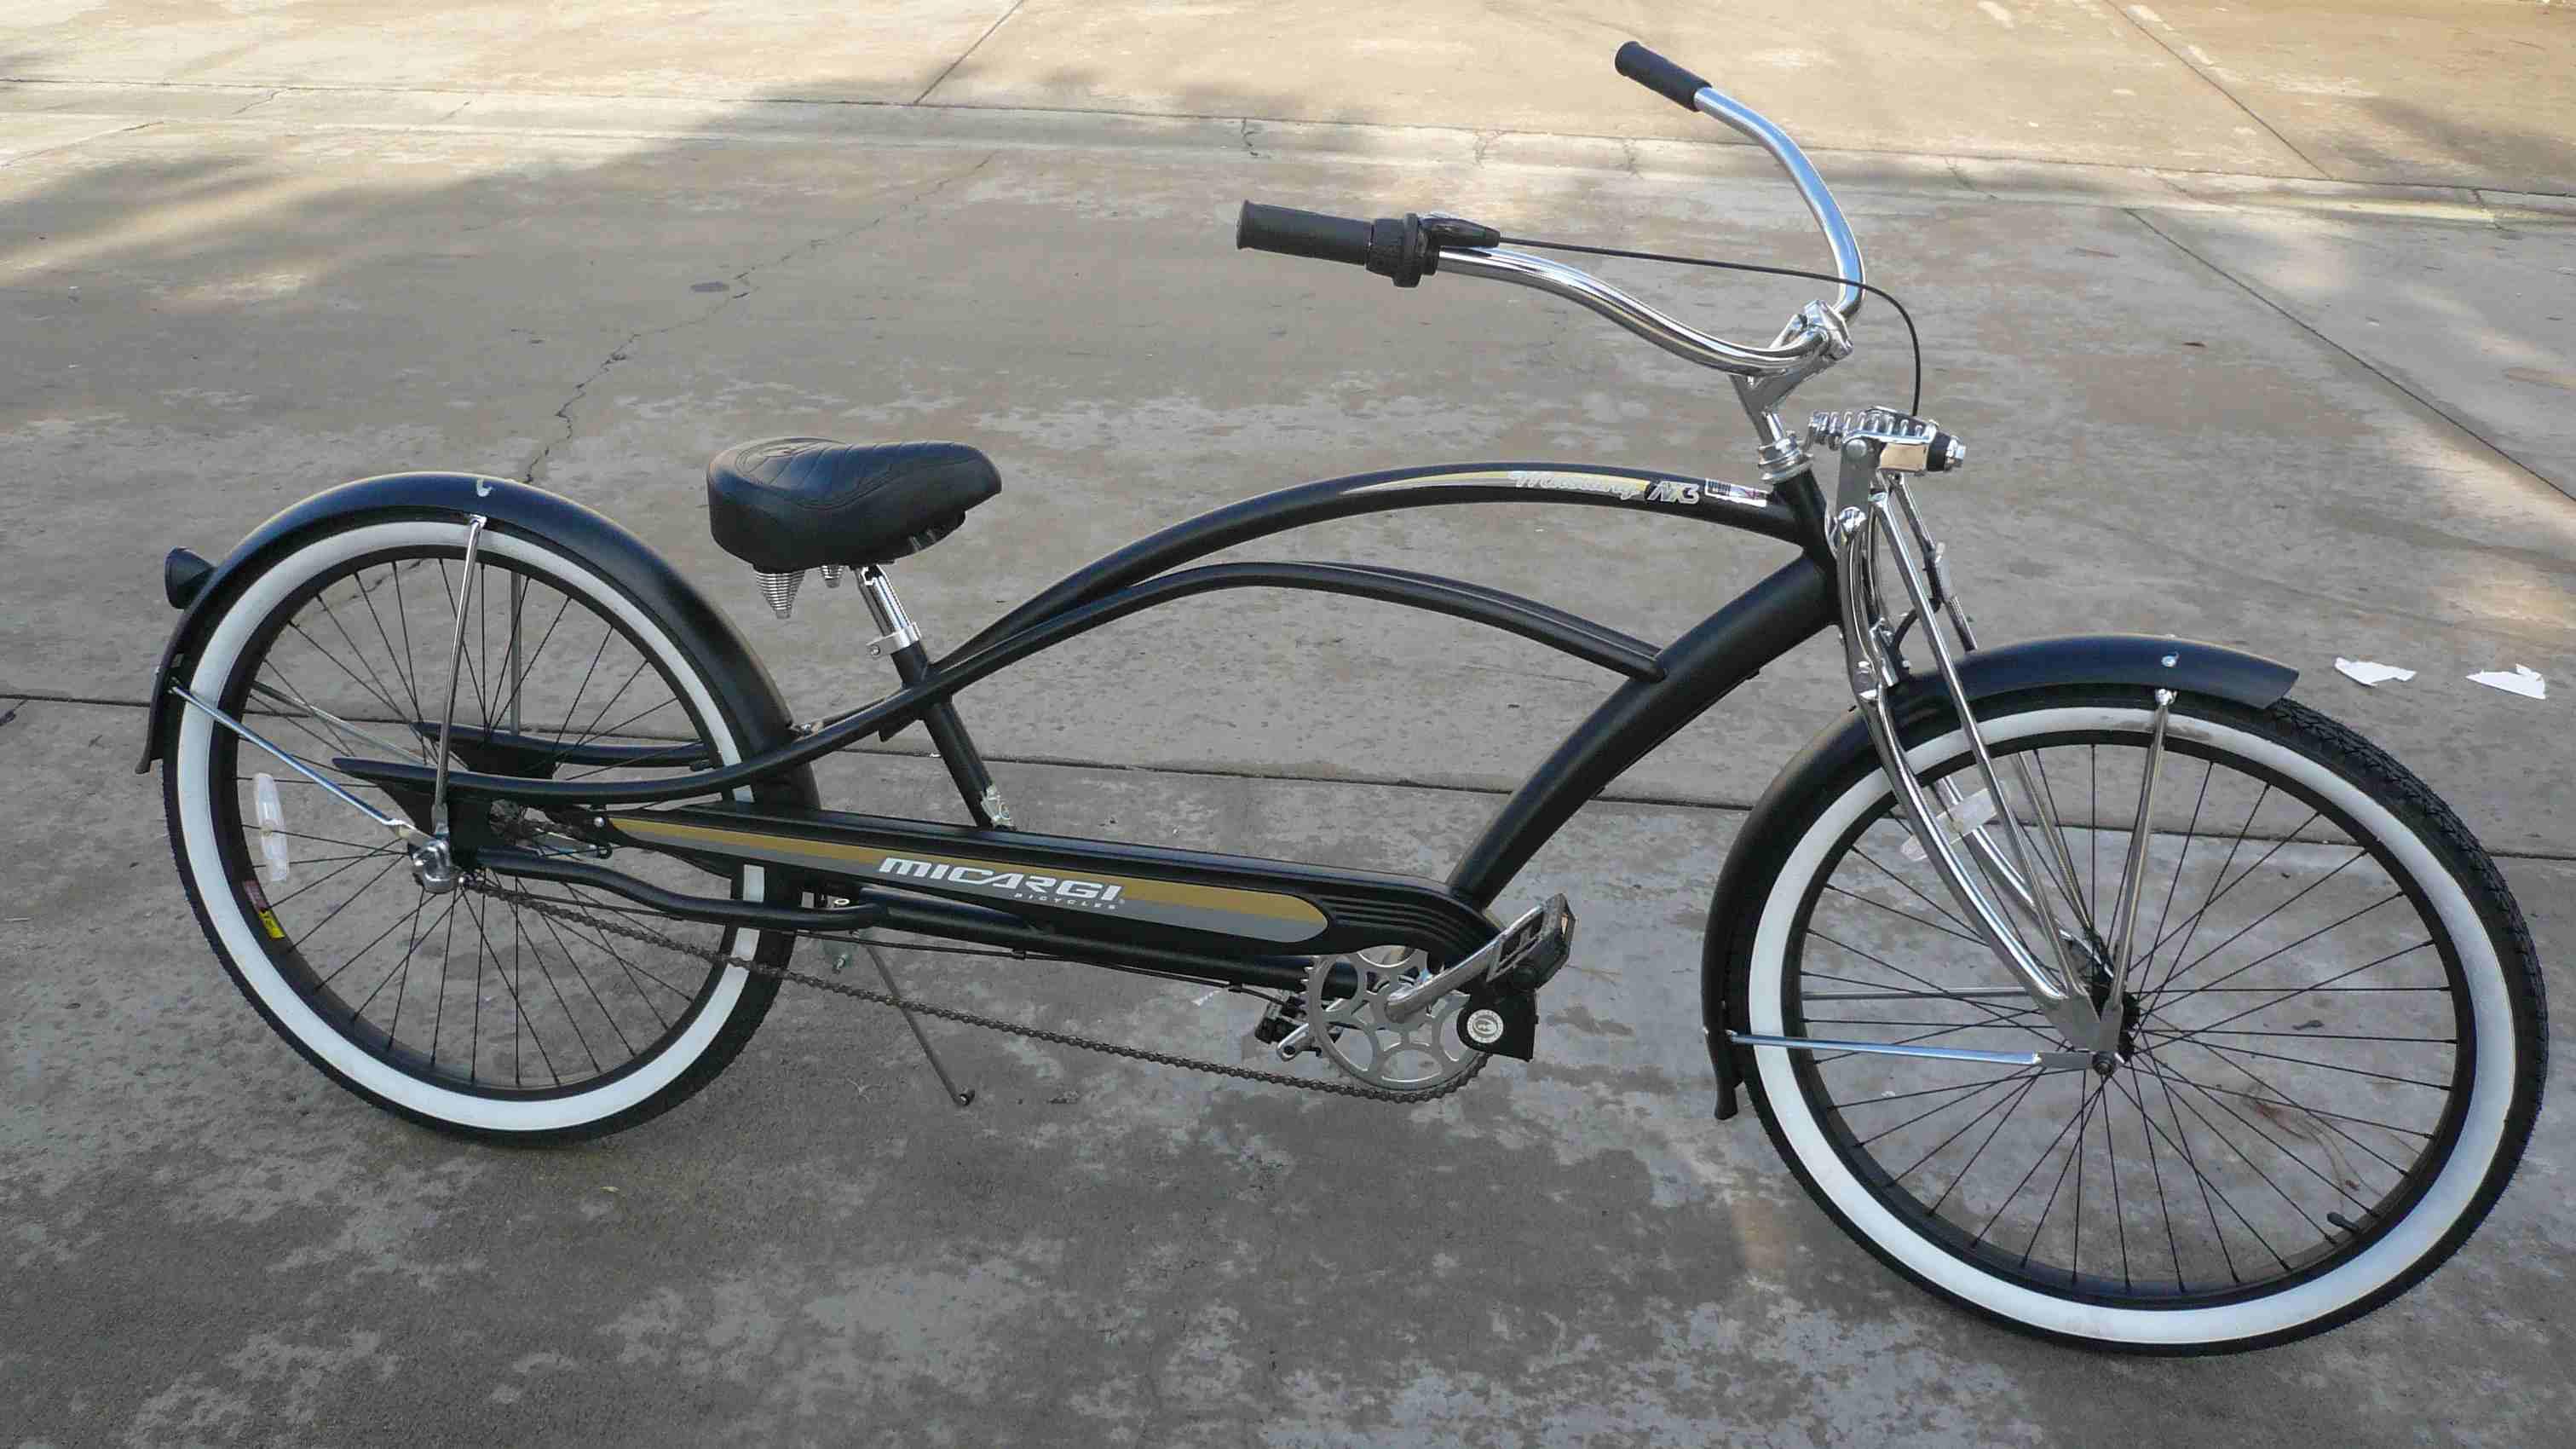 Micargi 26 Quot 3 Speed Stretch Beach Cruiser Bicycle 36